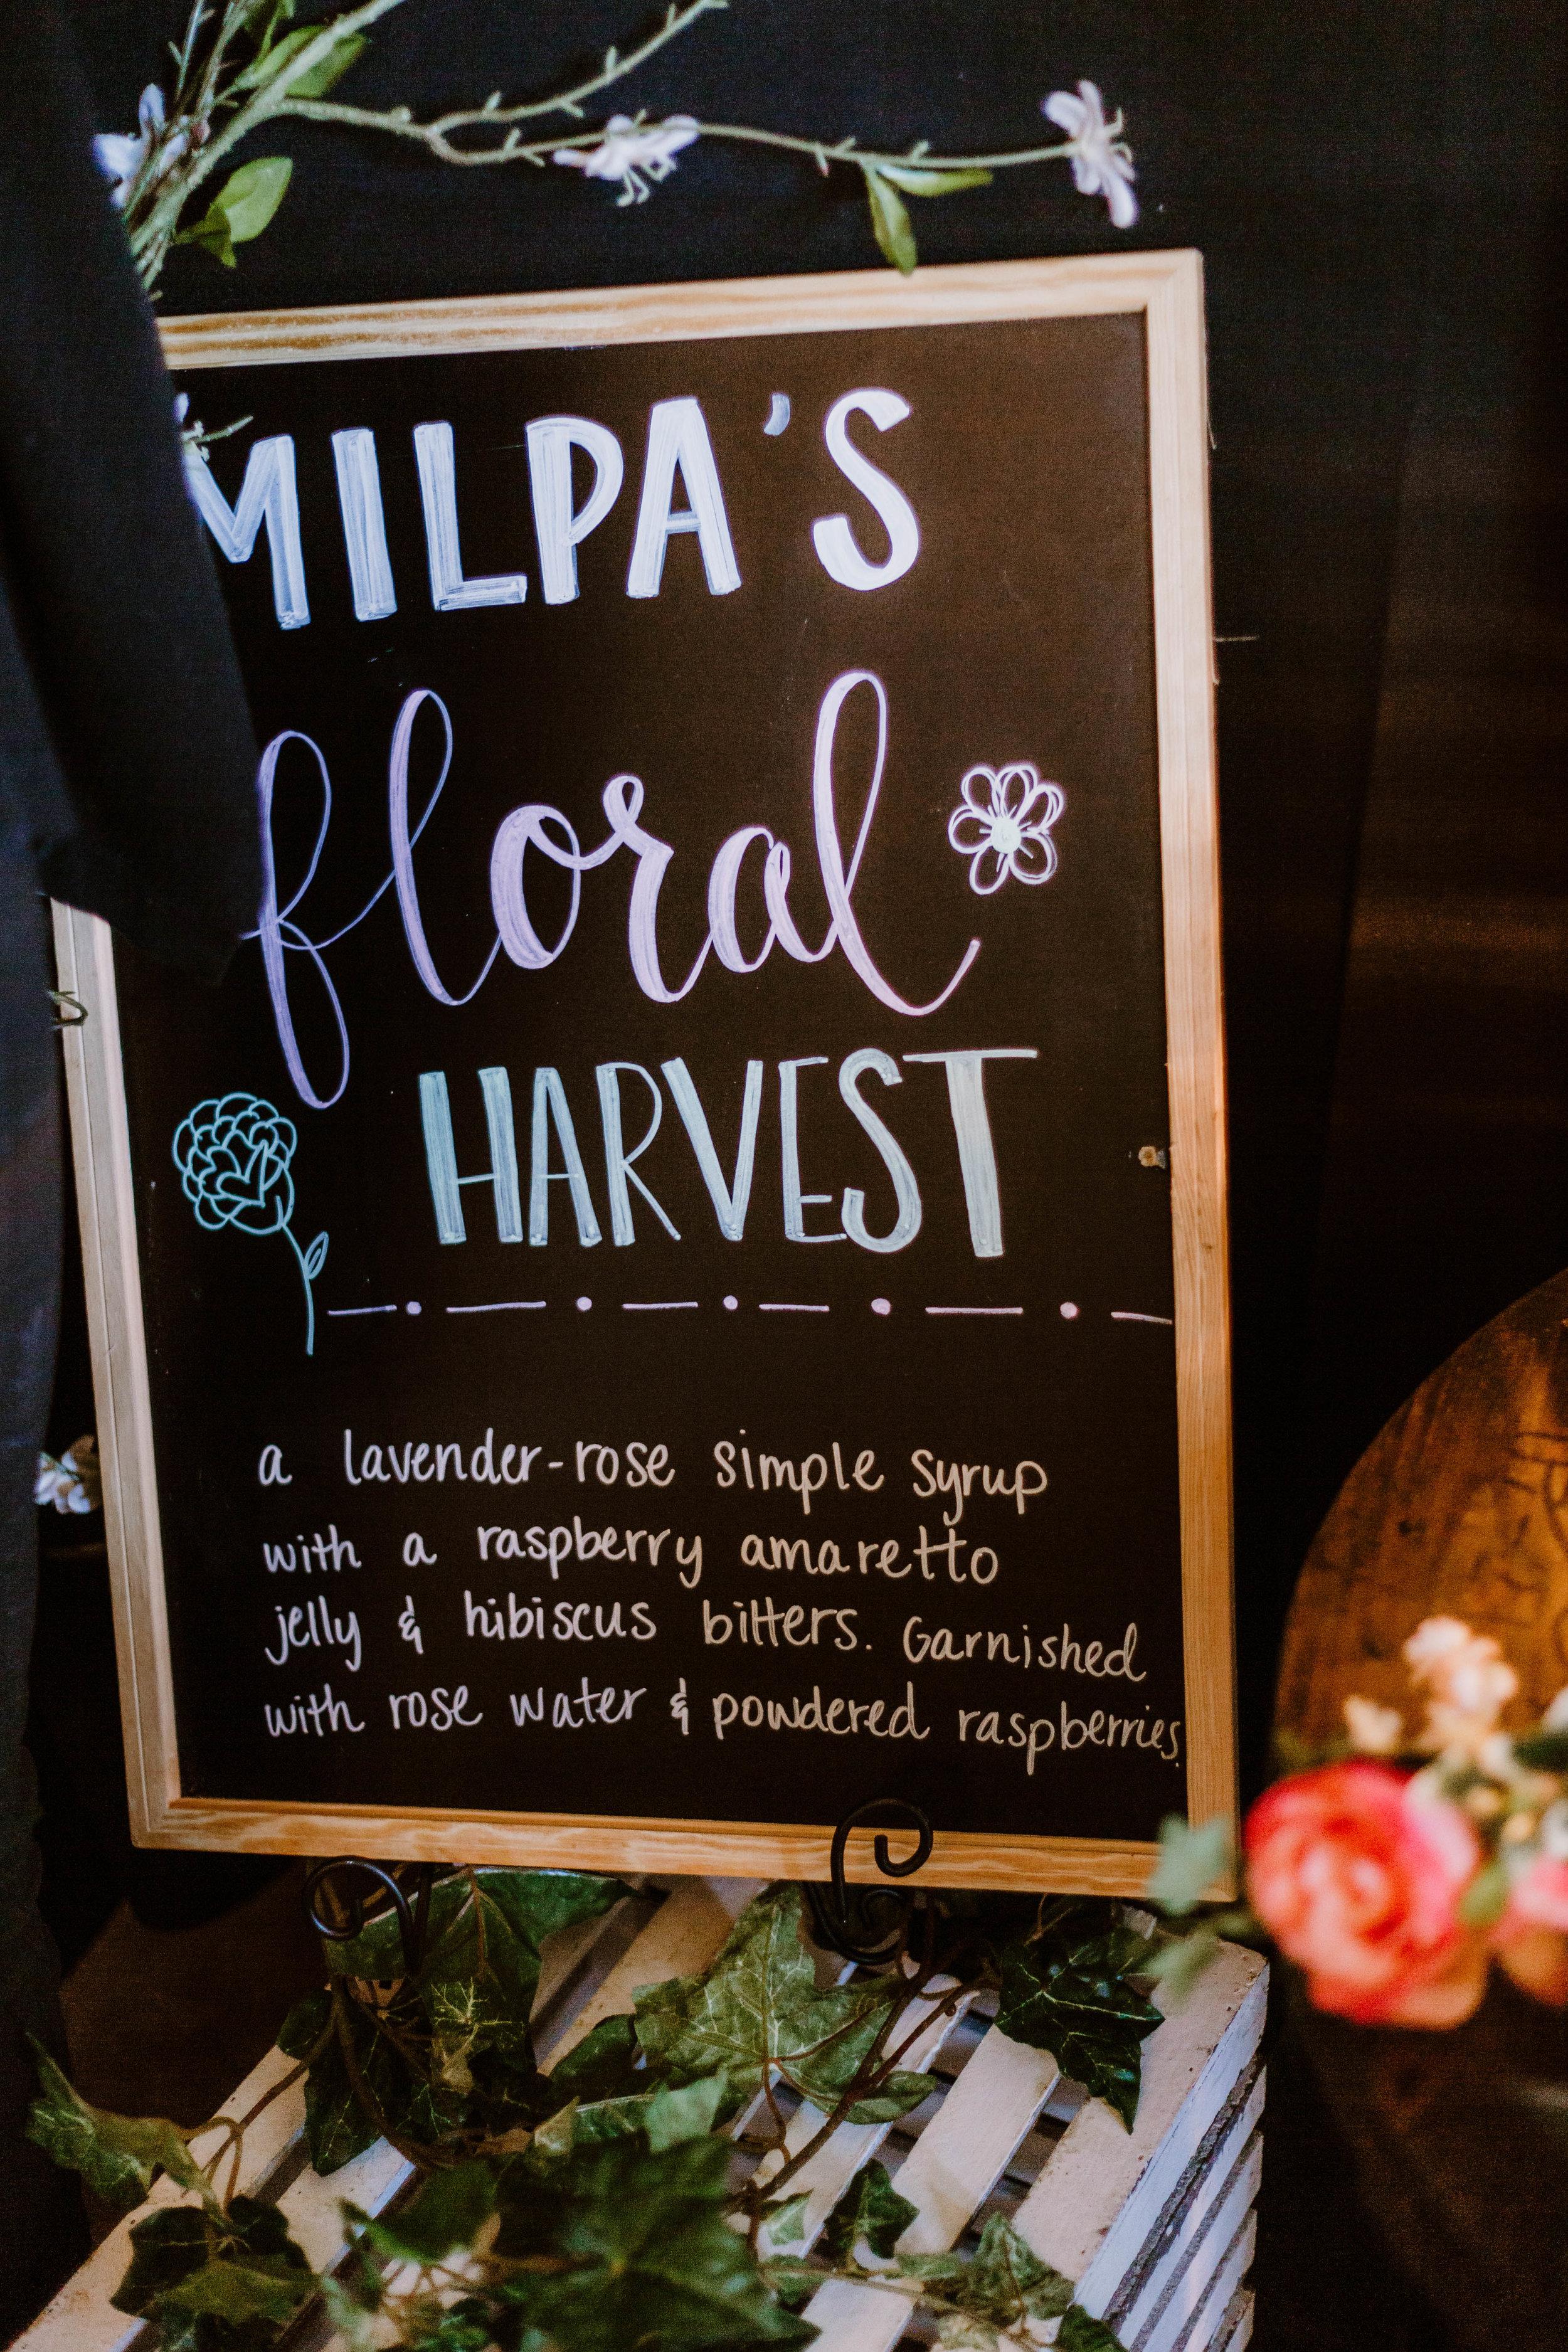 Milpa's Floral Harvest margarita.